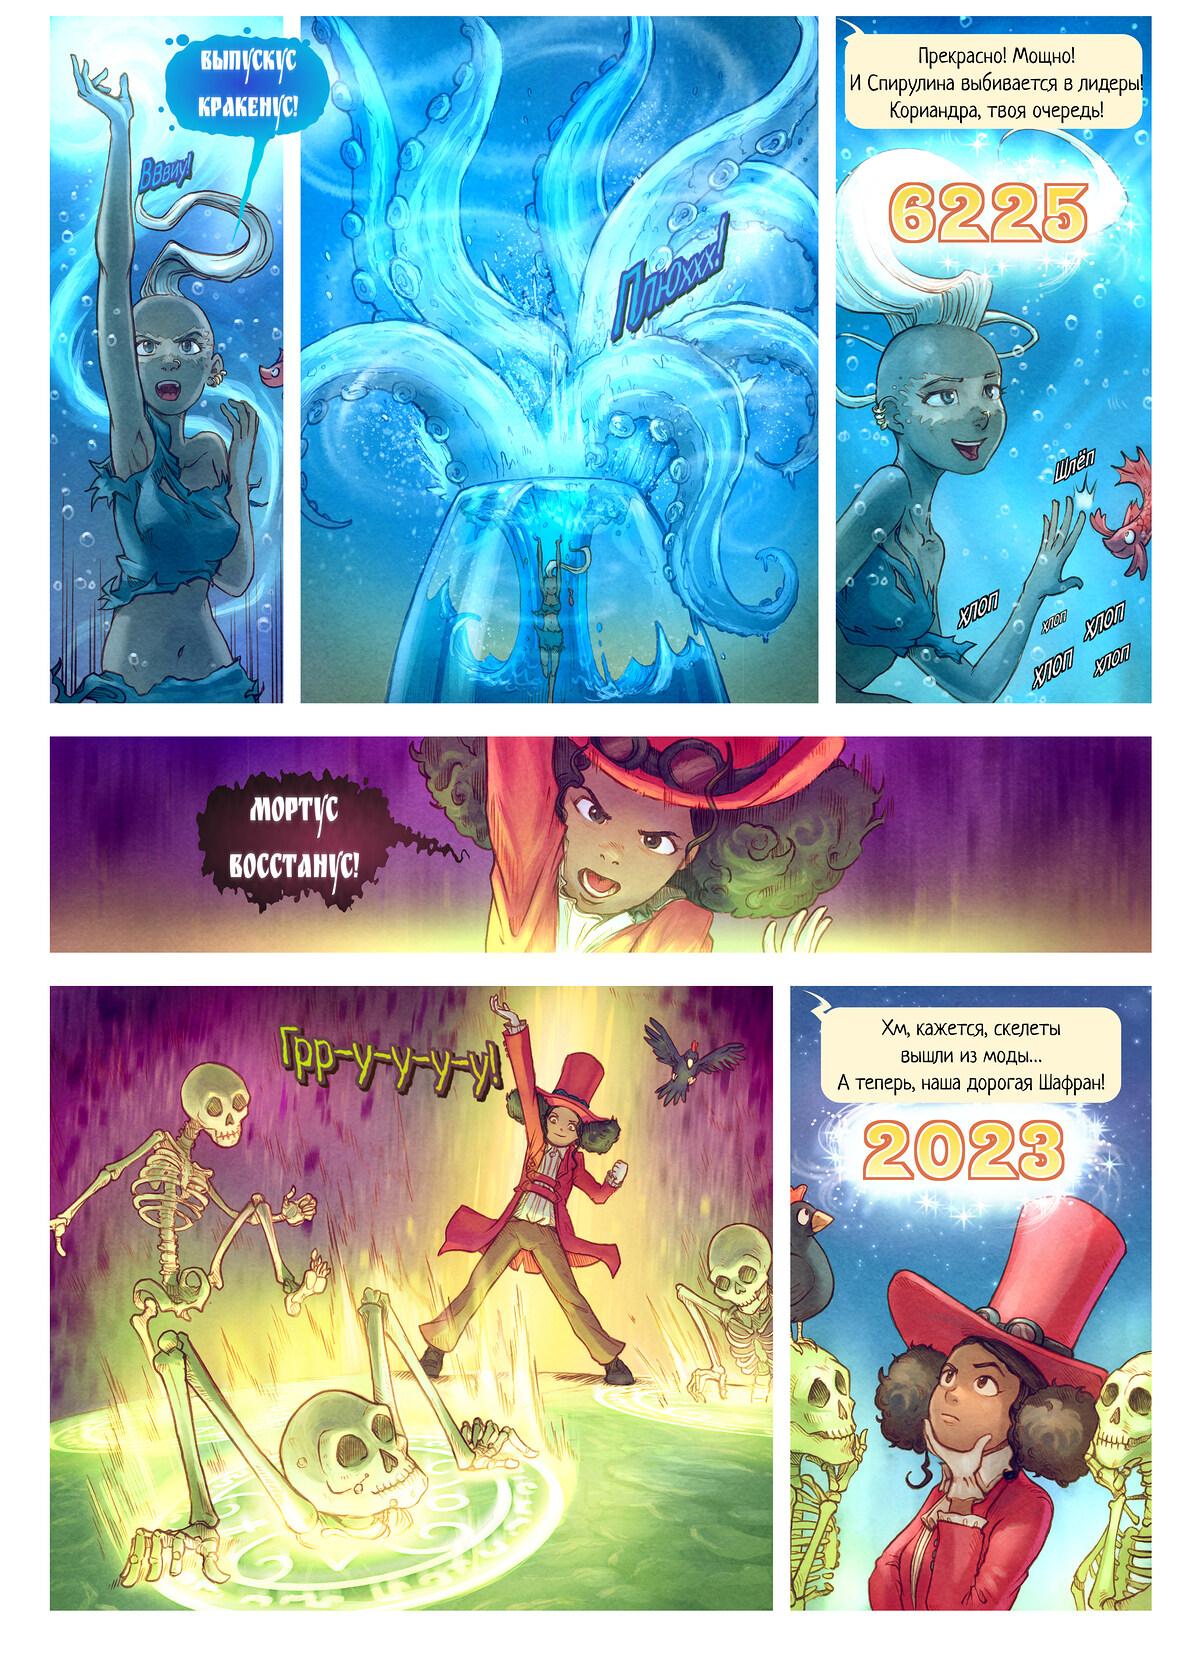 A webcomic page of Pepper&Carrot, эпизод 22 [ru], стр. 7